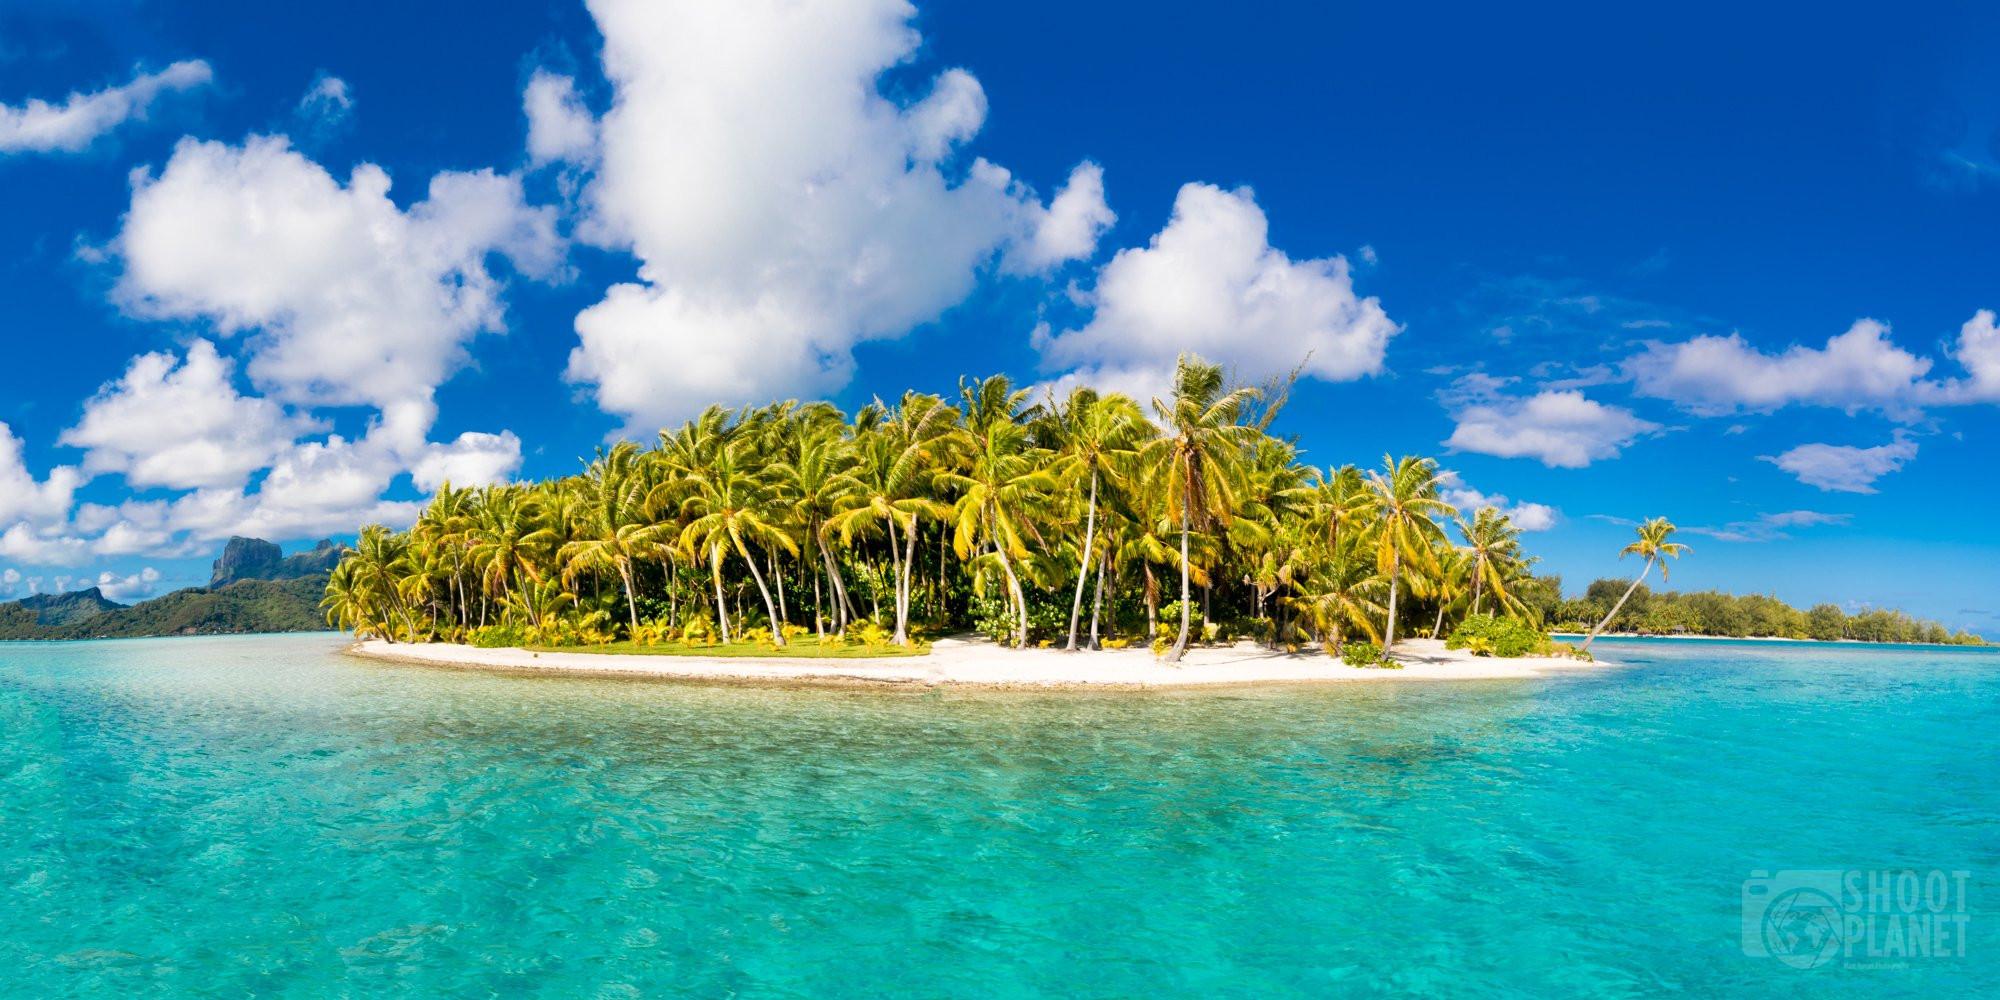 Motu Tane in Bora Bora island